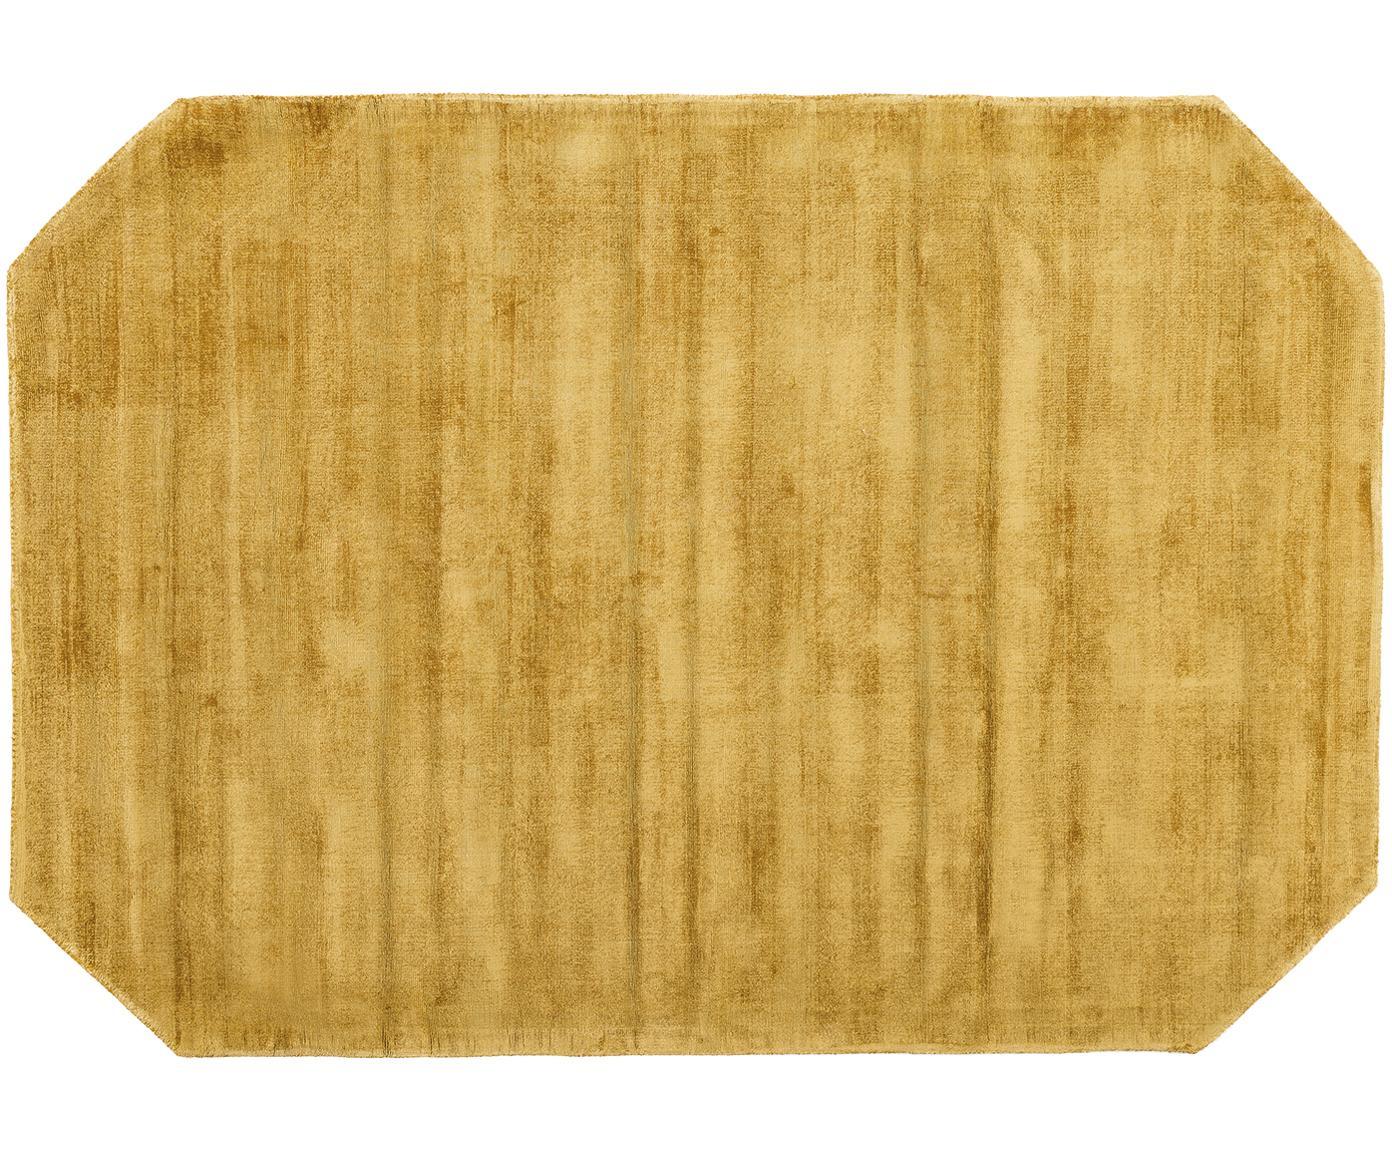 Alfombra artesanal de viscosa Jane Diamond, Parte superior: 100%viscosa, Reverso: 100%algodón, Mostaza, An 120 x L 180 cm (Tamaño S)